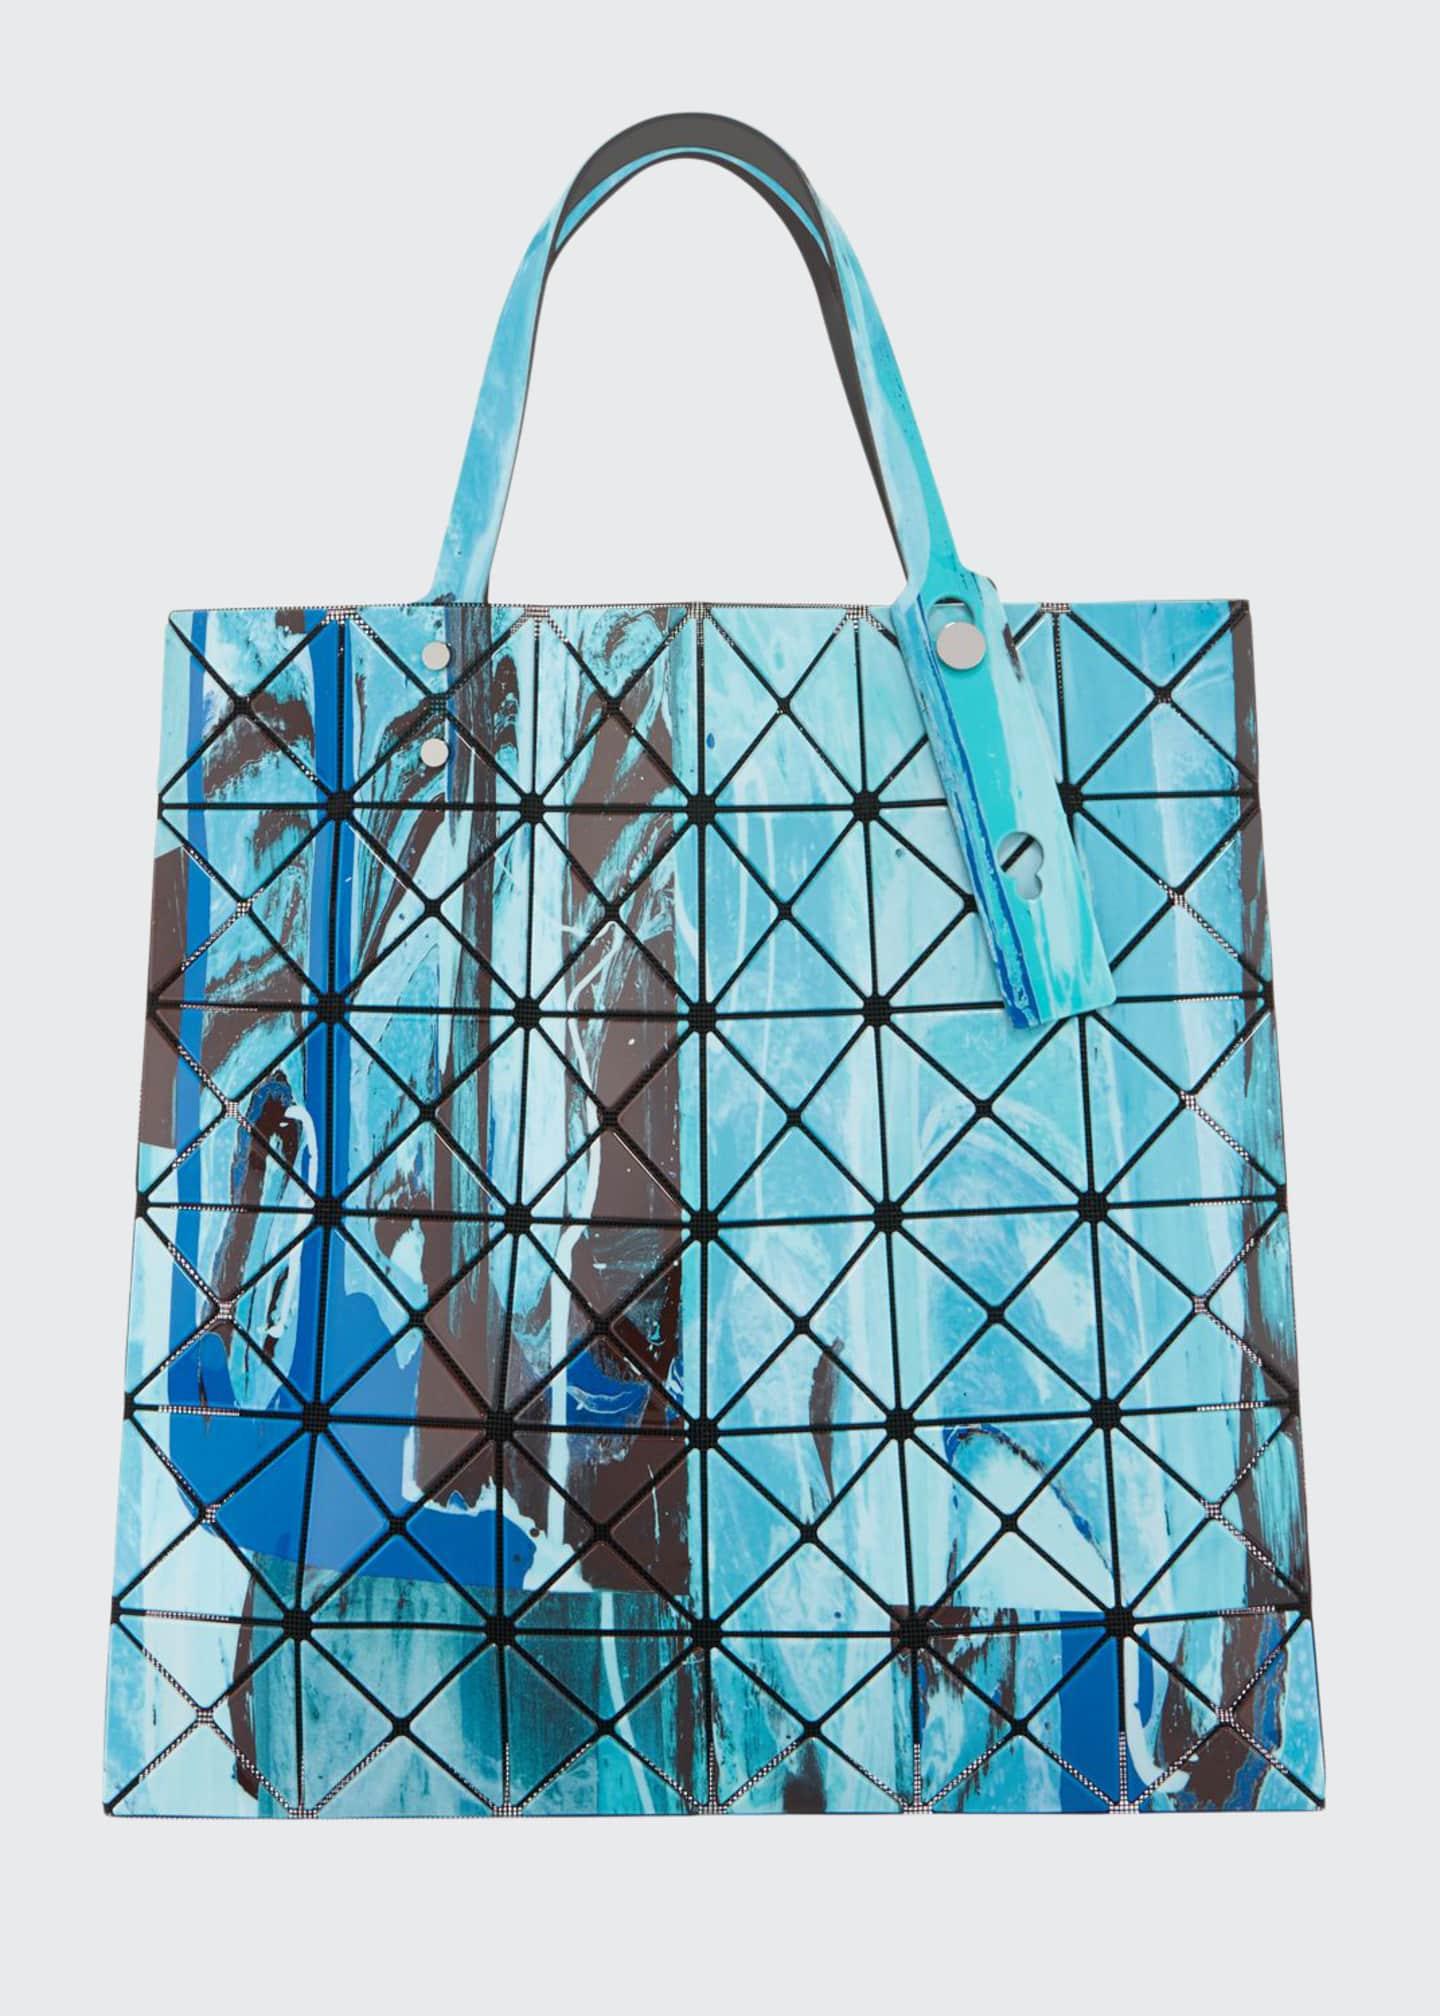 BAO BAO ISSEY MIYAKE Gravity Painted Tote Bag